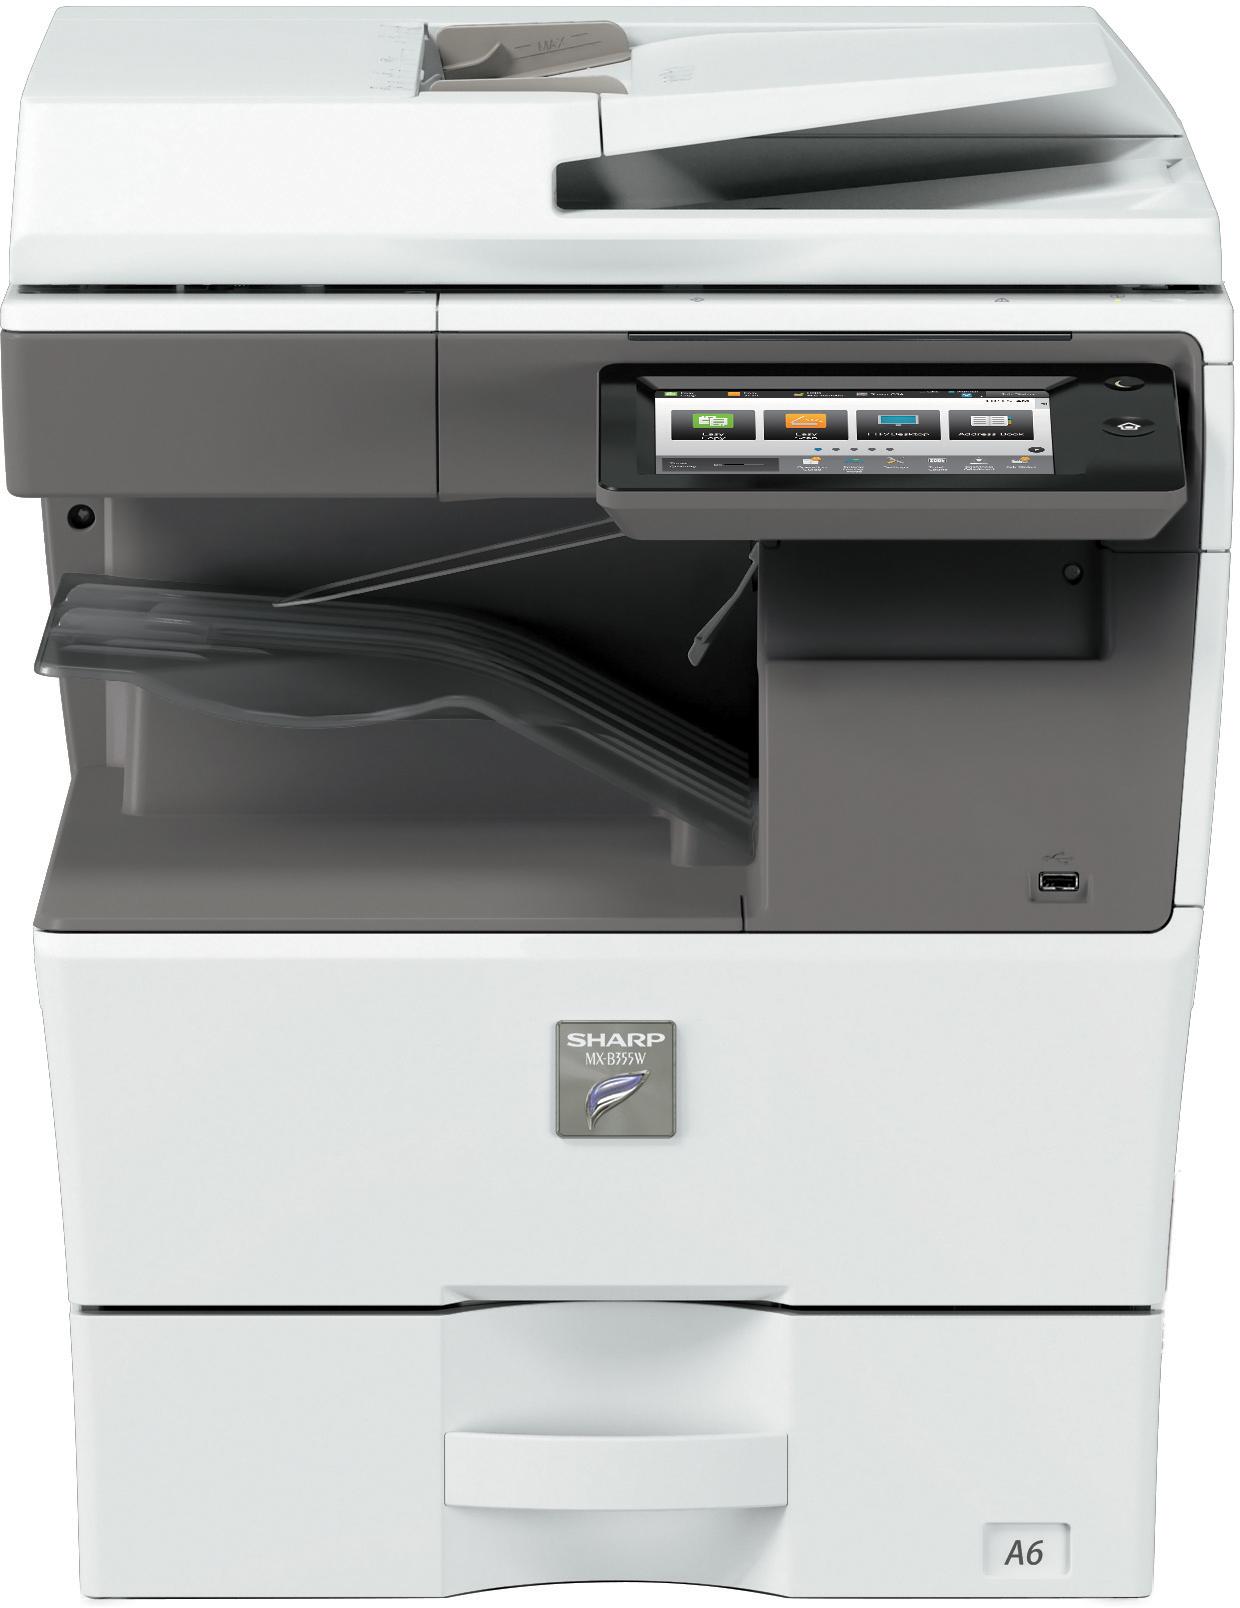 Sharp MXB355W_MXB455W front